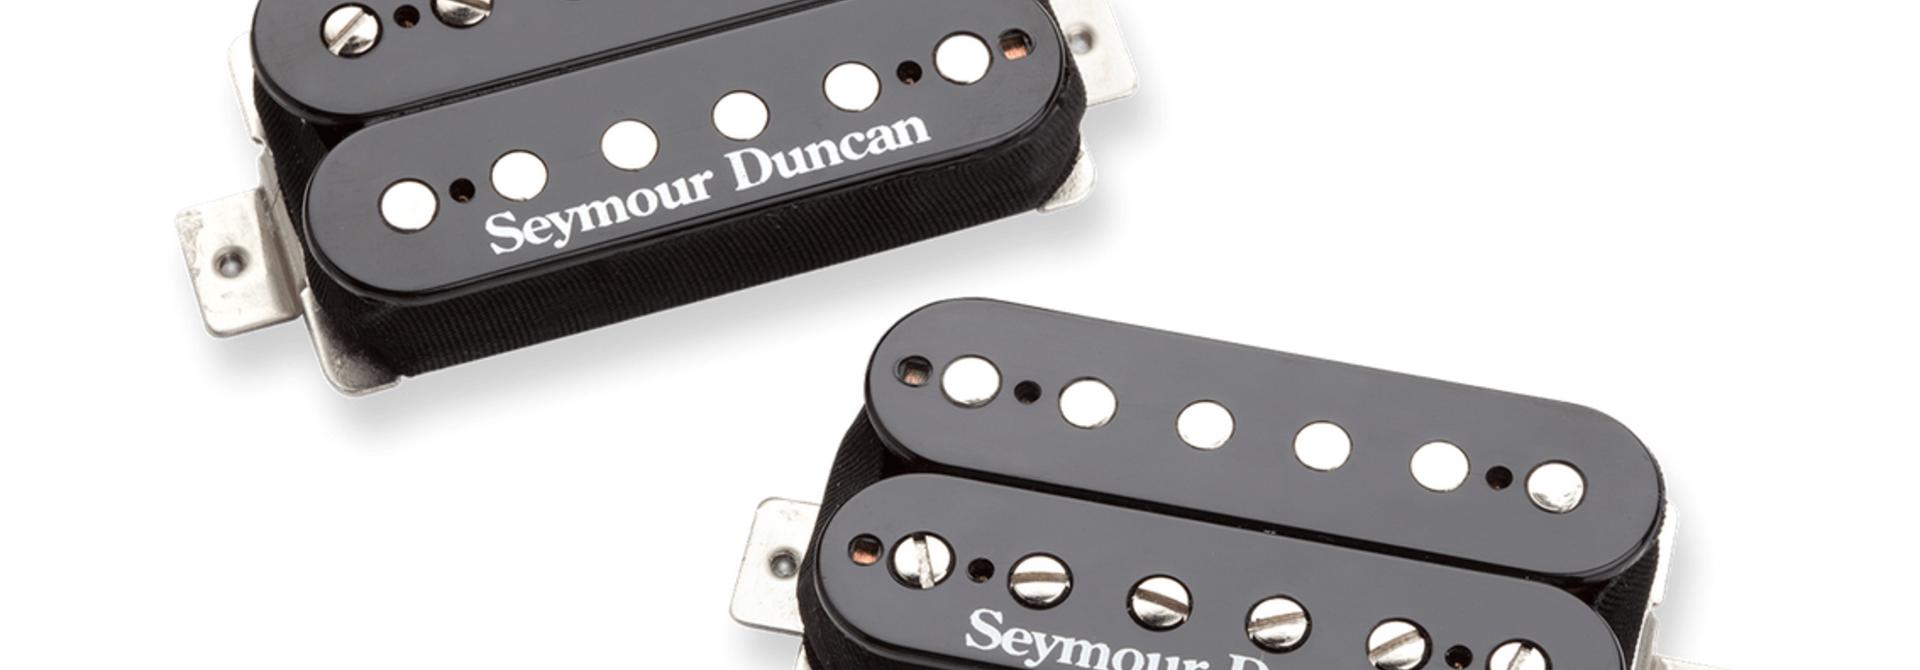 Seymour Duncan Hot Rodded Humbucker Set 11108-13-B